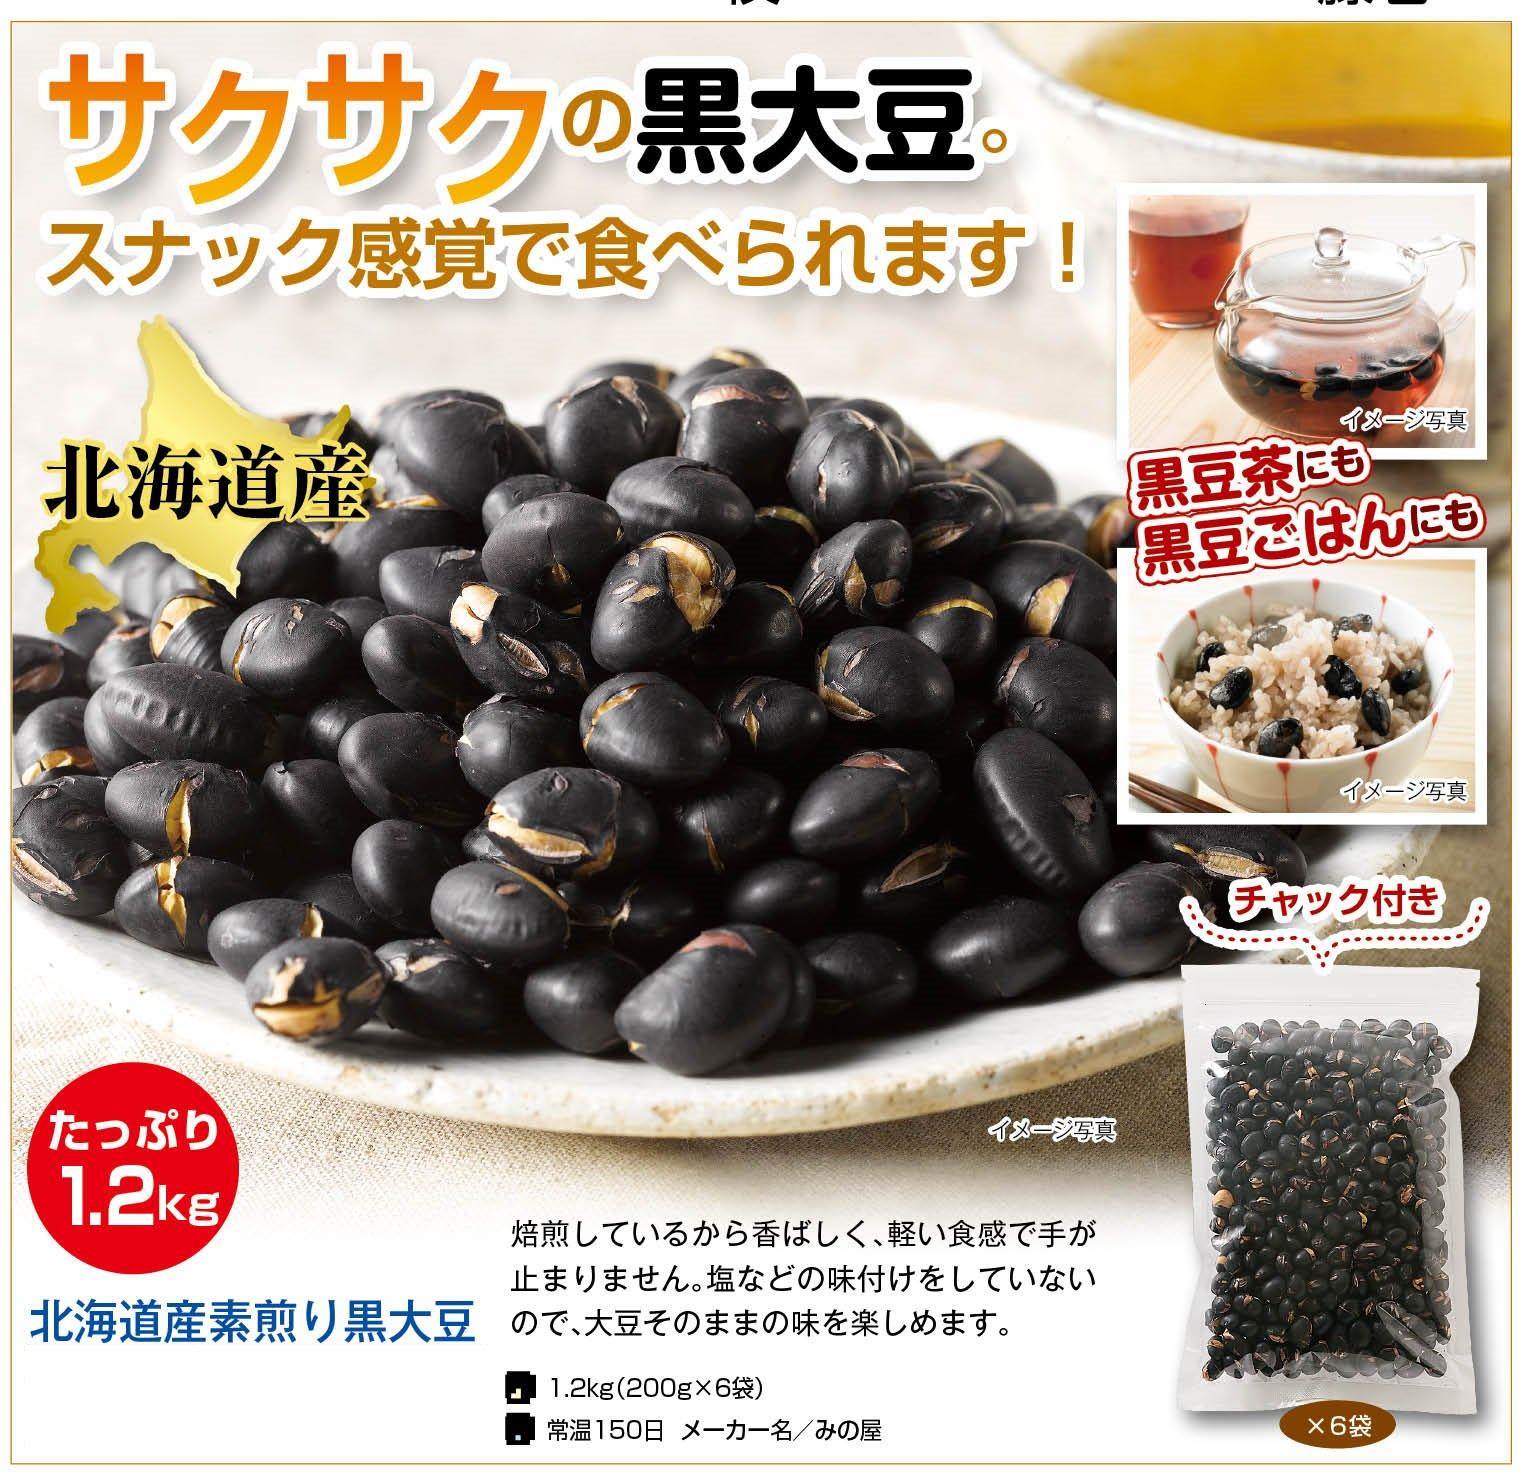 北海道産素煎り黒大豆 1.2kg(200g×6袋)